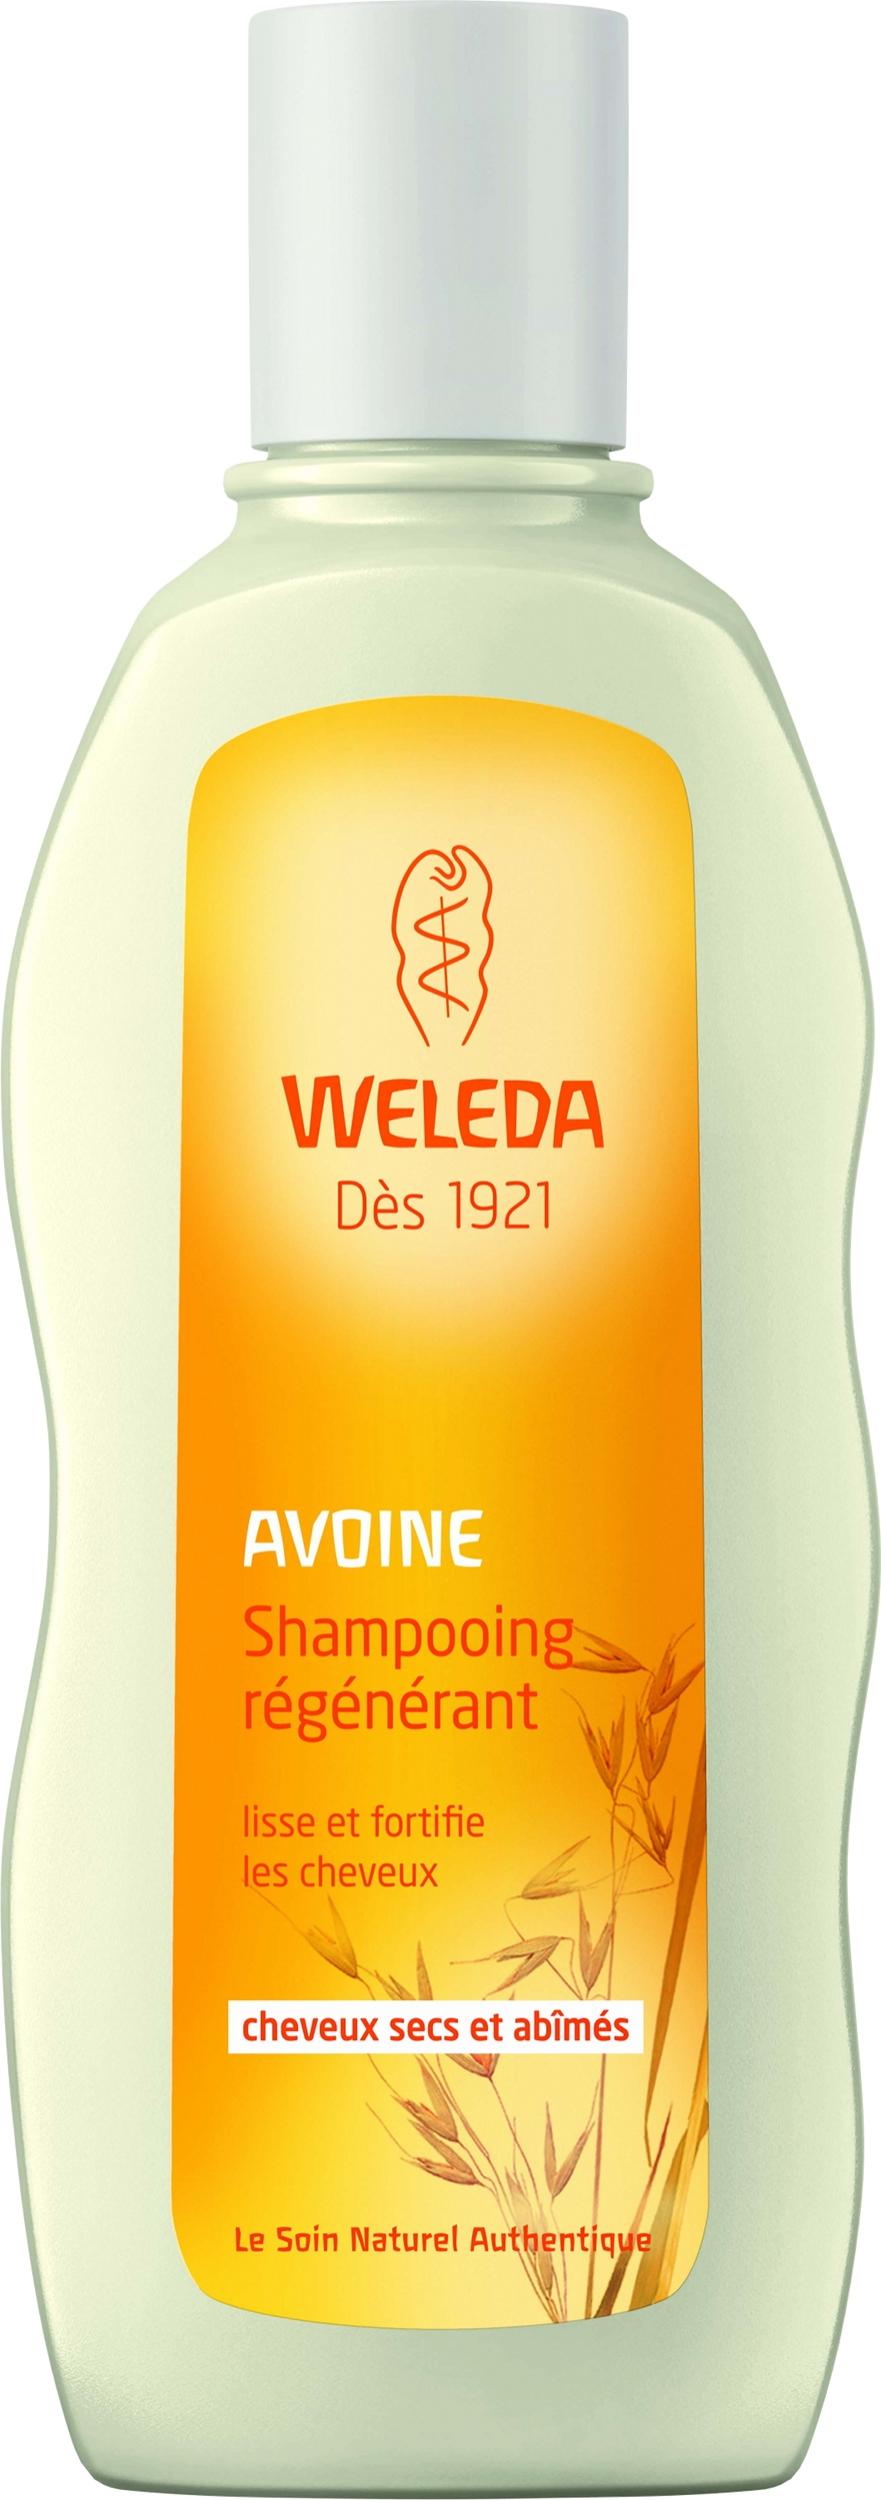 Doux Good - Weleda - Shampoing a l avoine regenerant